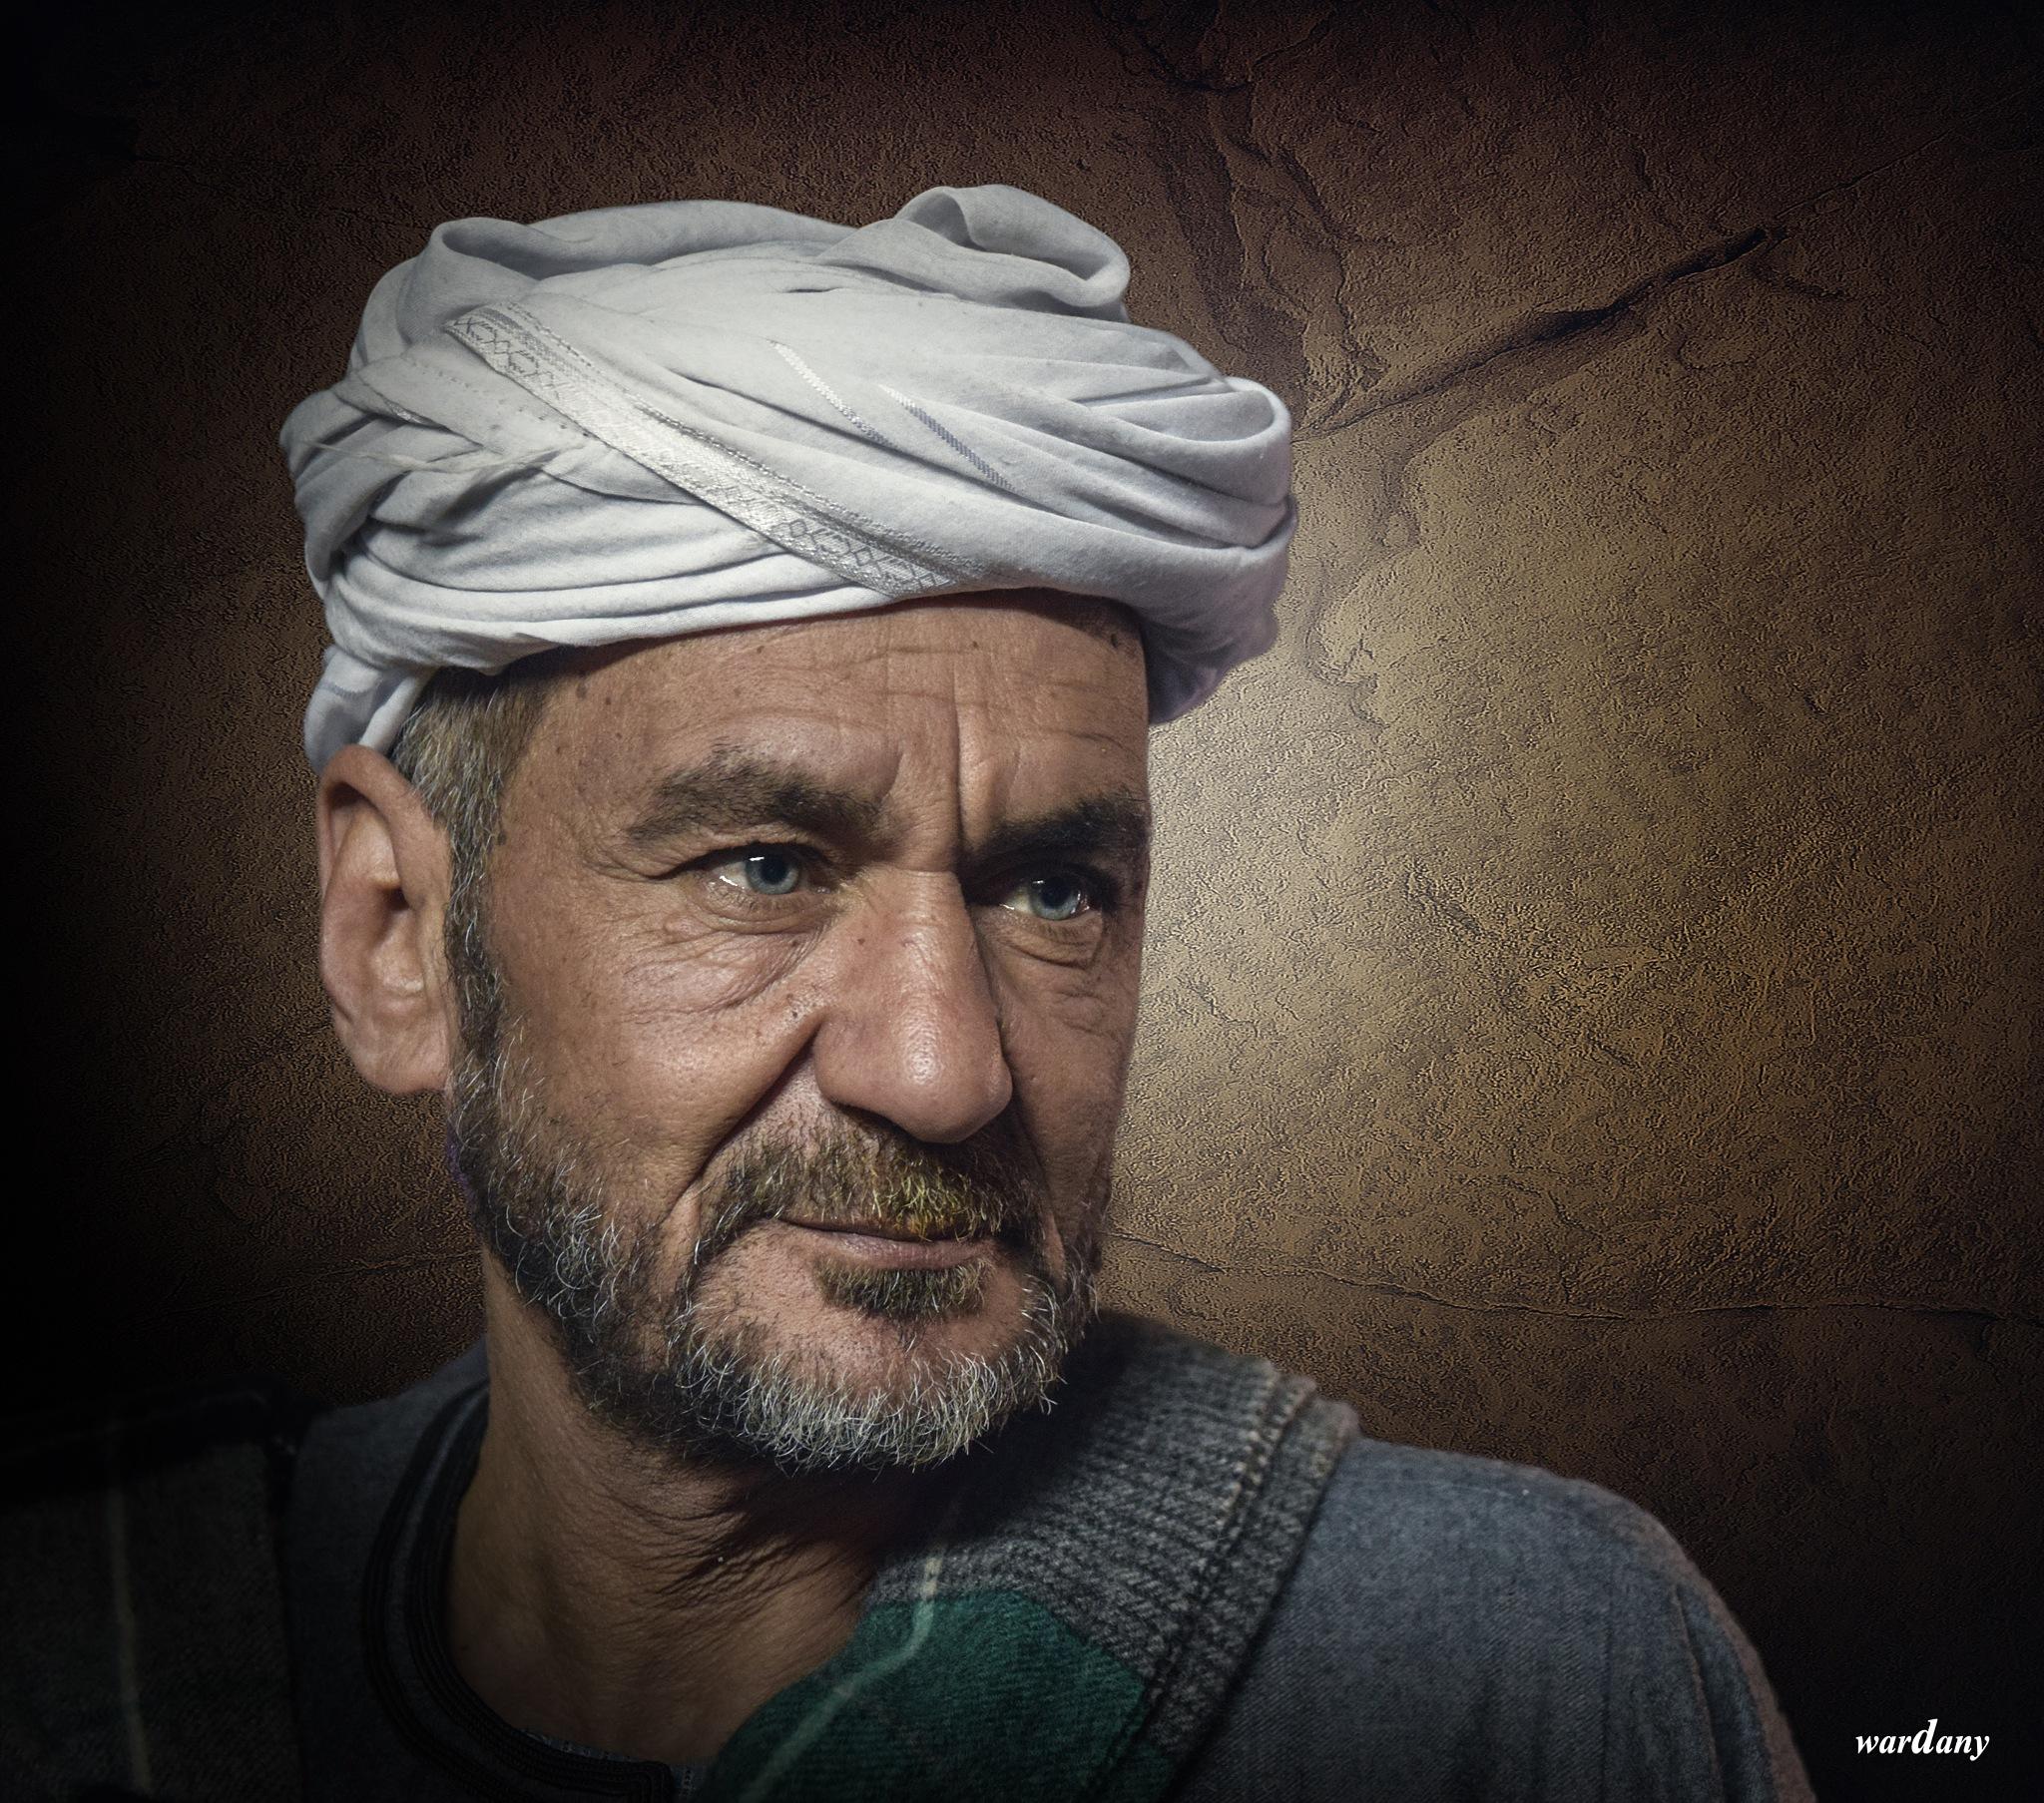 ابو مدحت by mohamed wardany